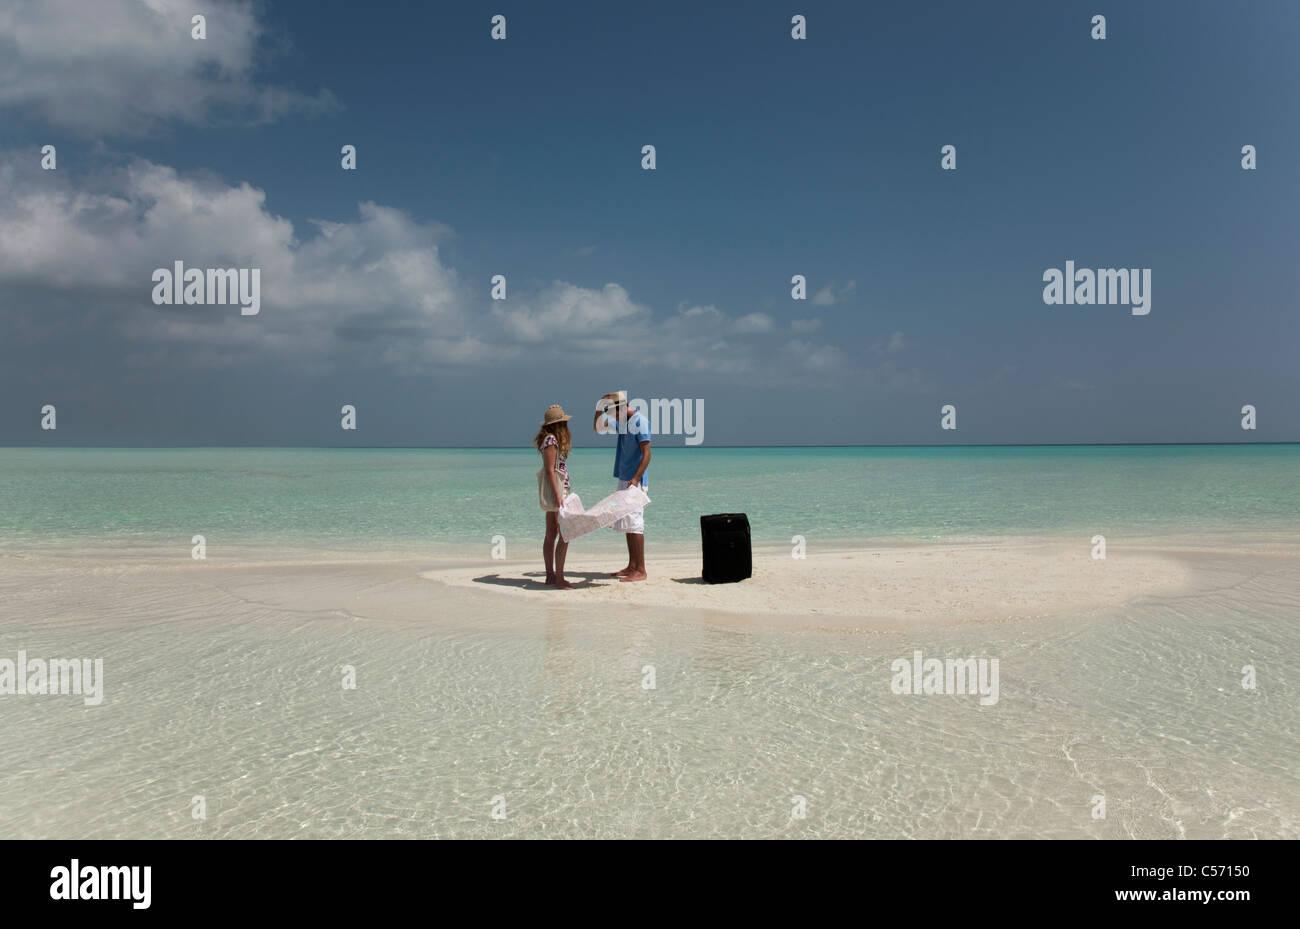 Lesung-Karte verloren paar am Strand Stockbild